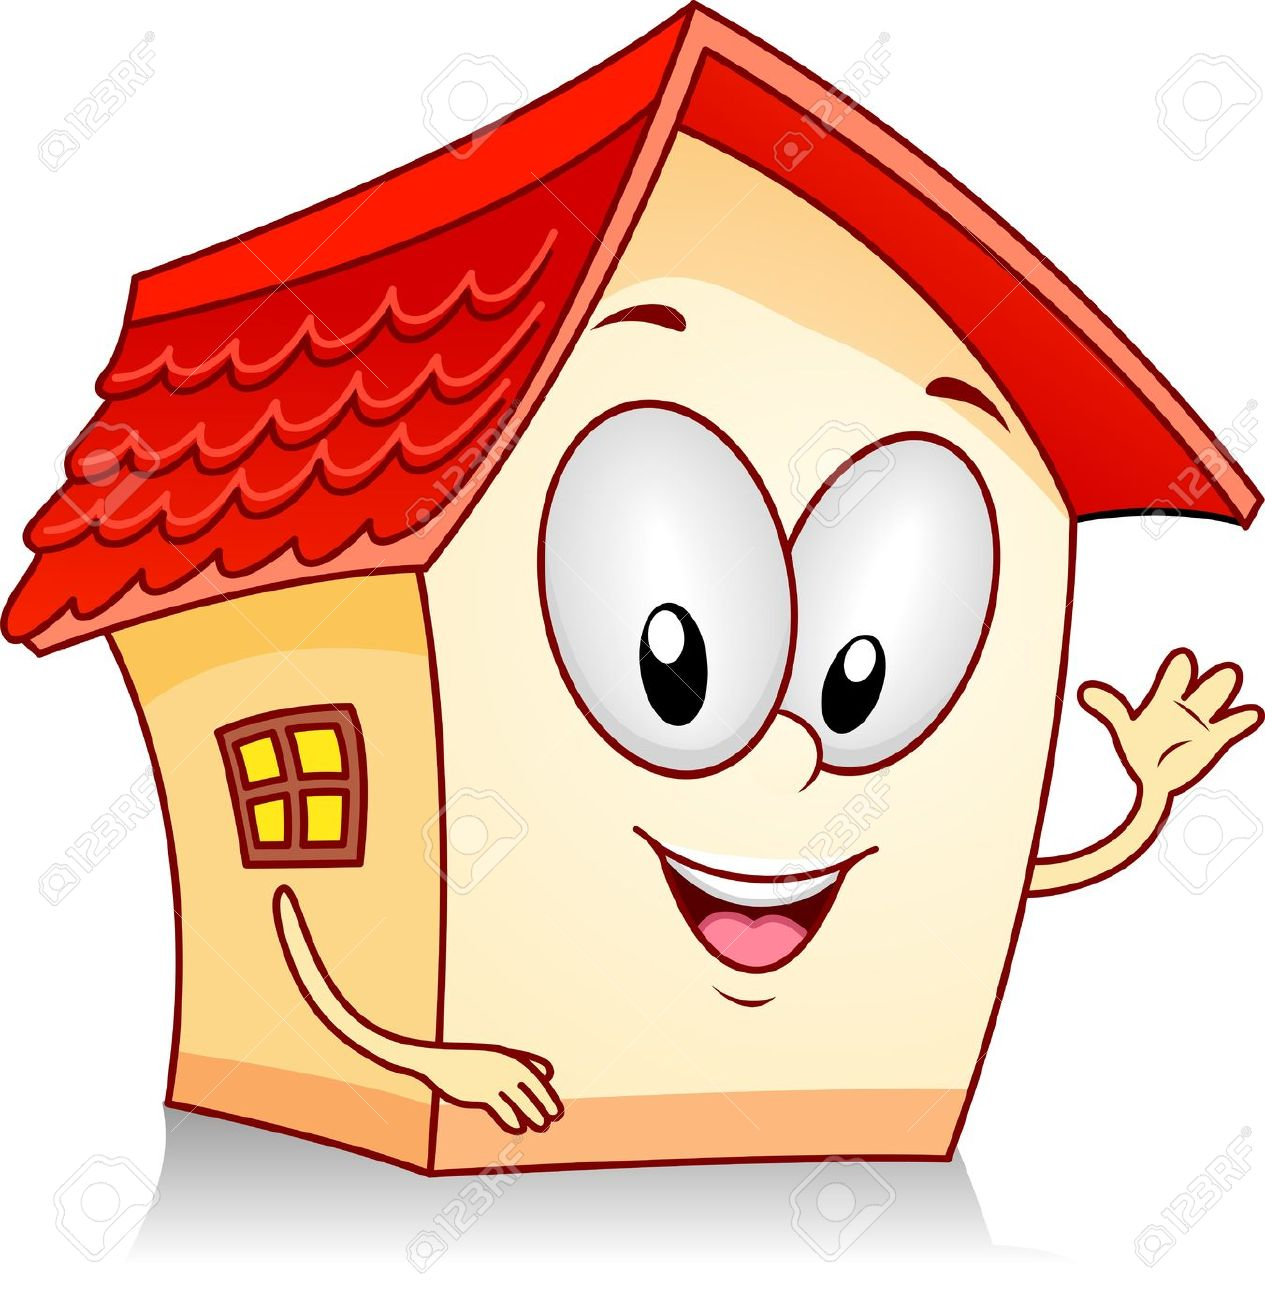 cartoon clipart of houses - photo #48